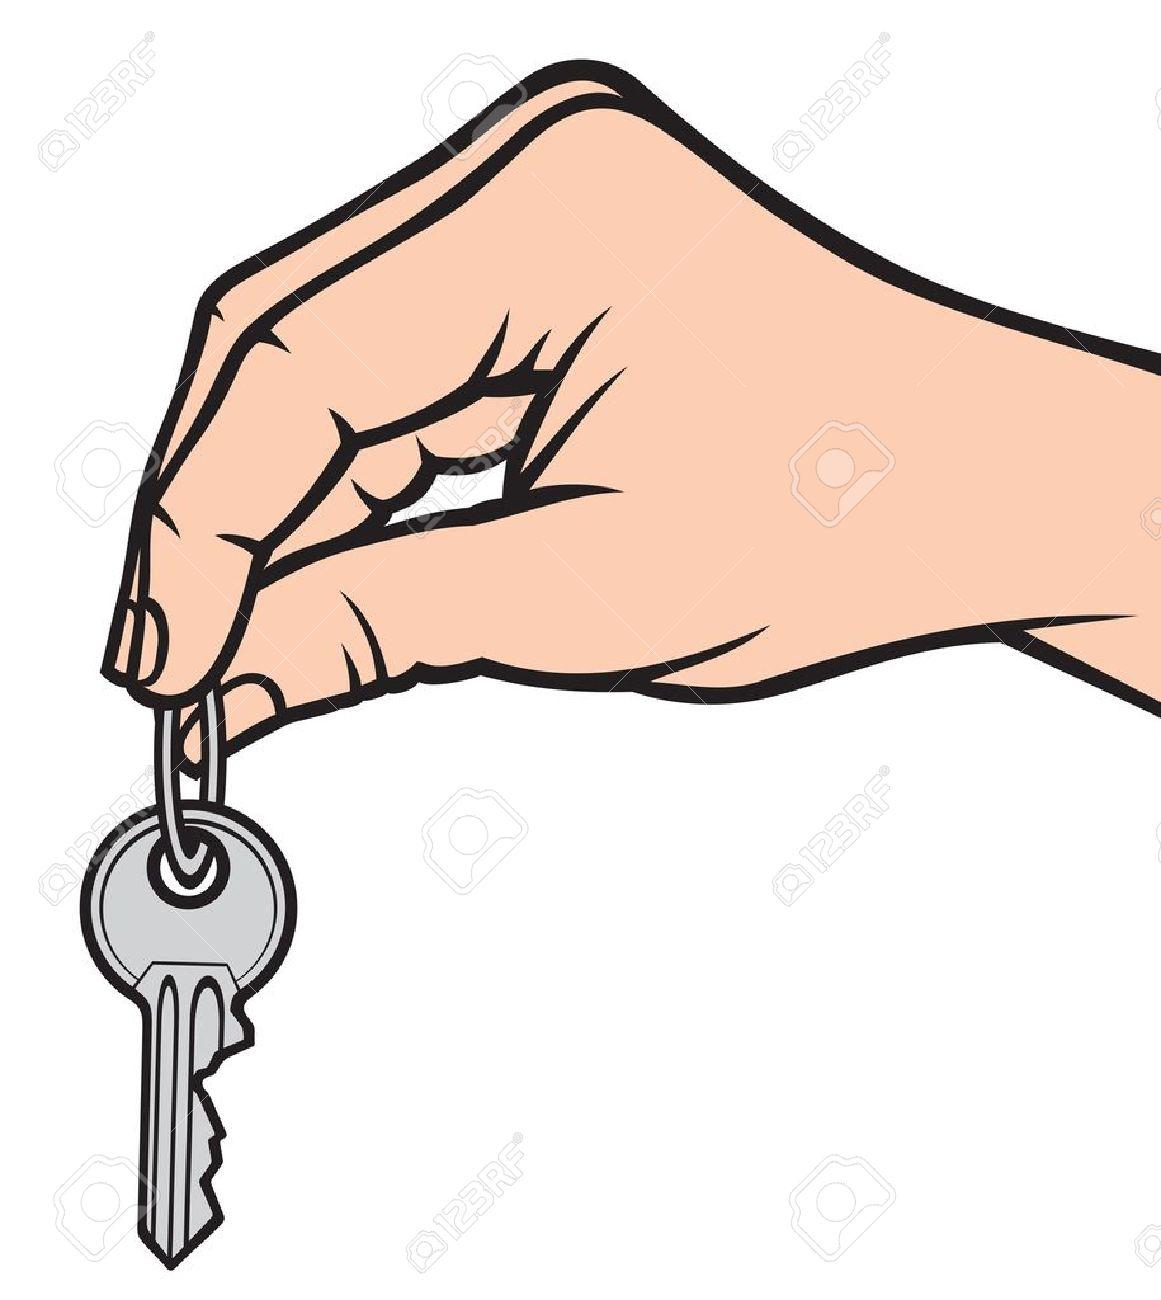 Image result for cartoon hand holding keys